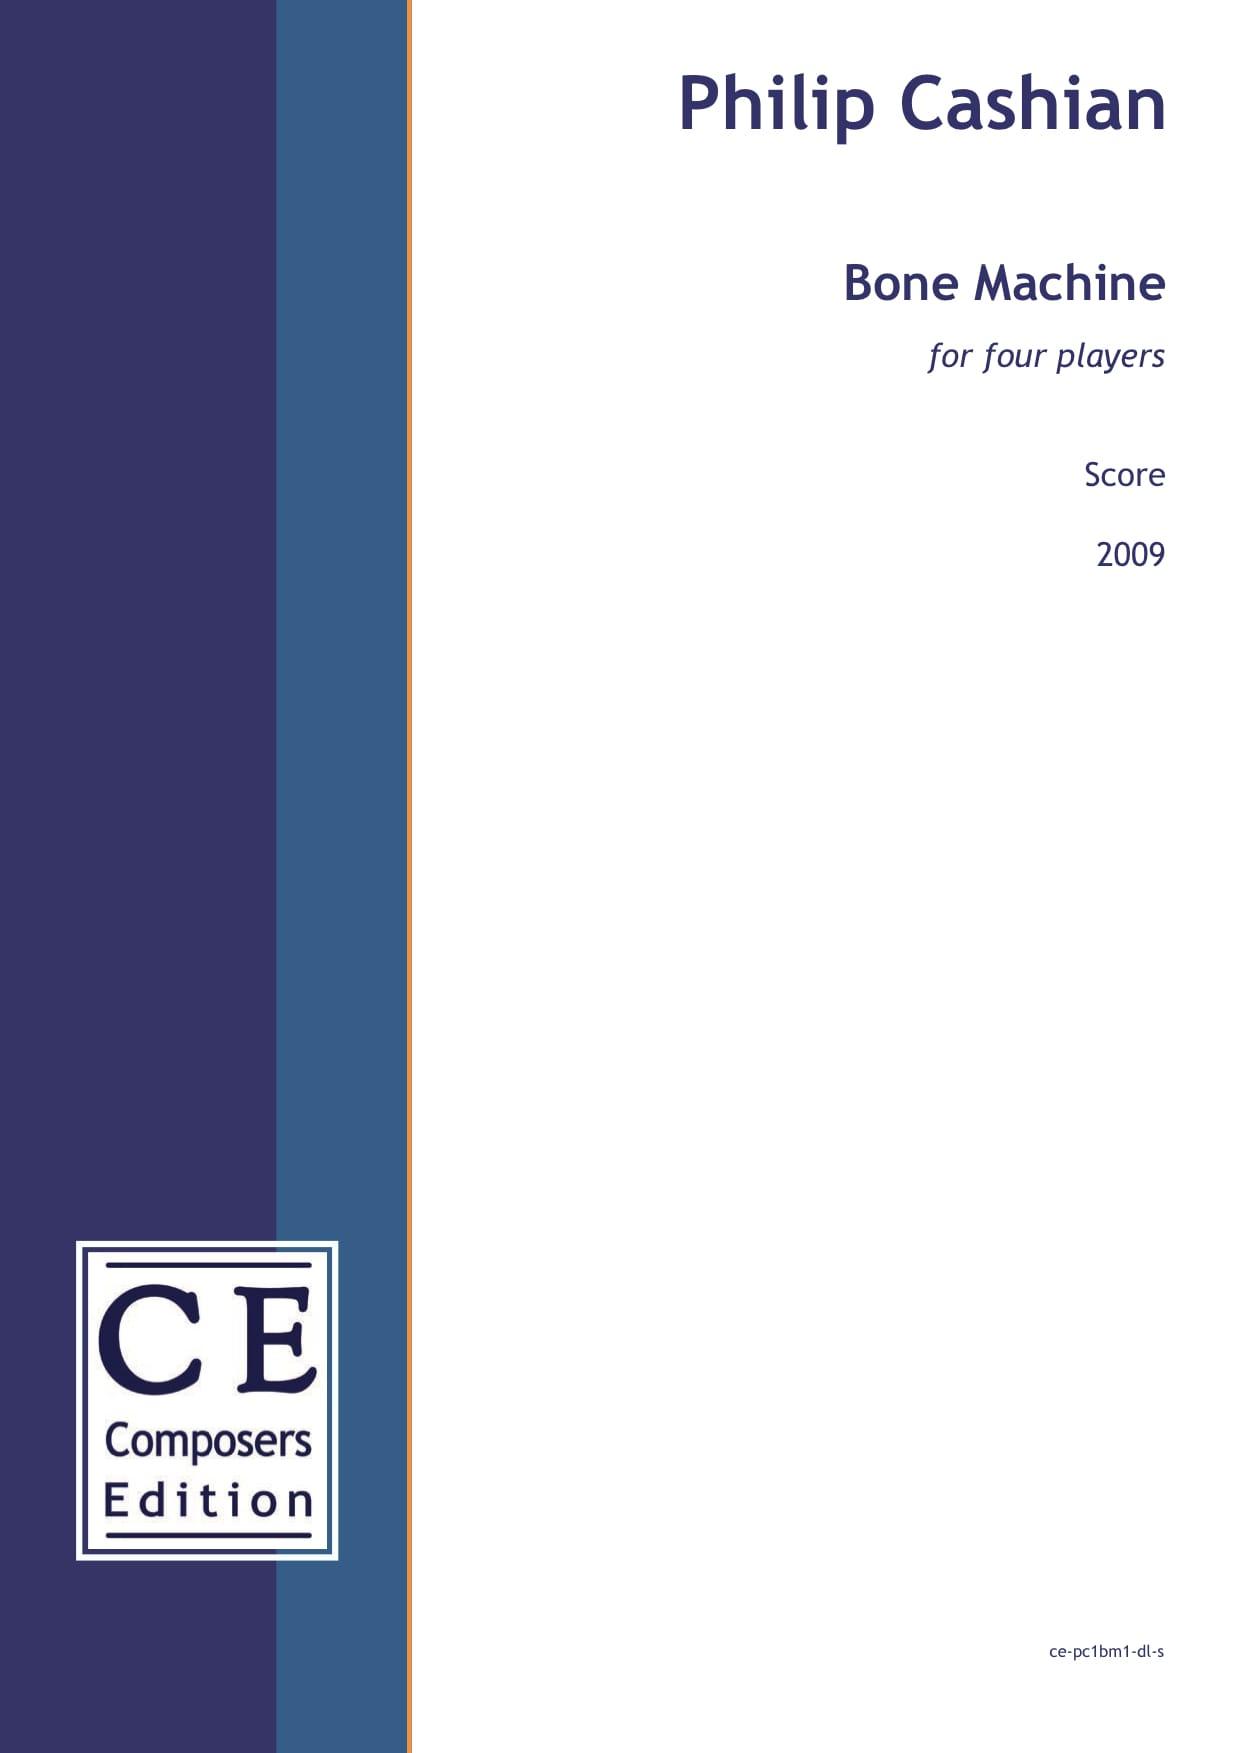 Philip Cashian: Bone Machine for four players